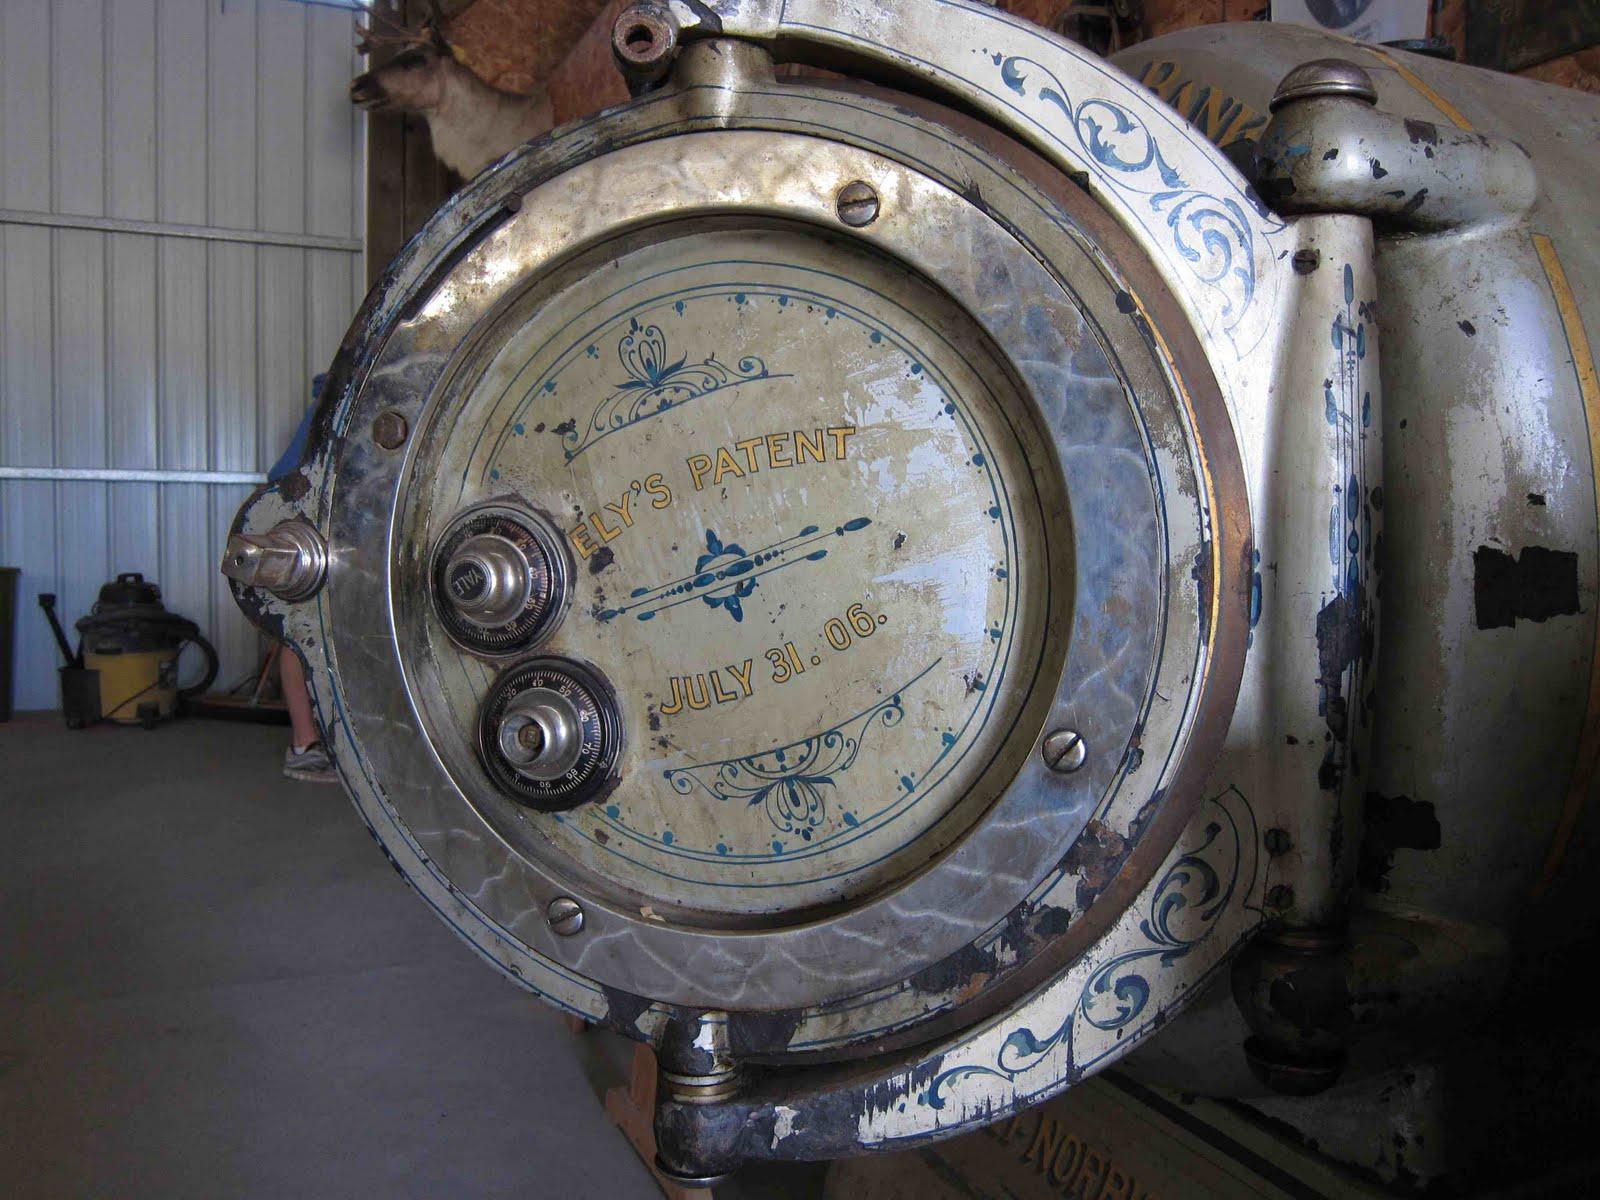 Antique Safes and Vaults: 2011